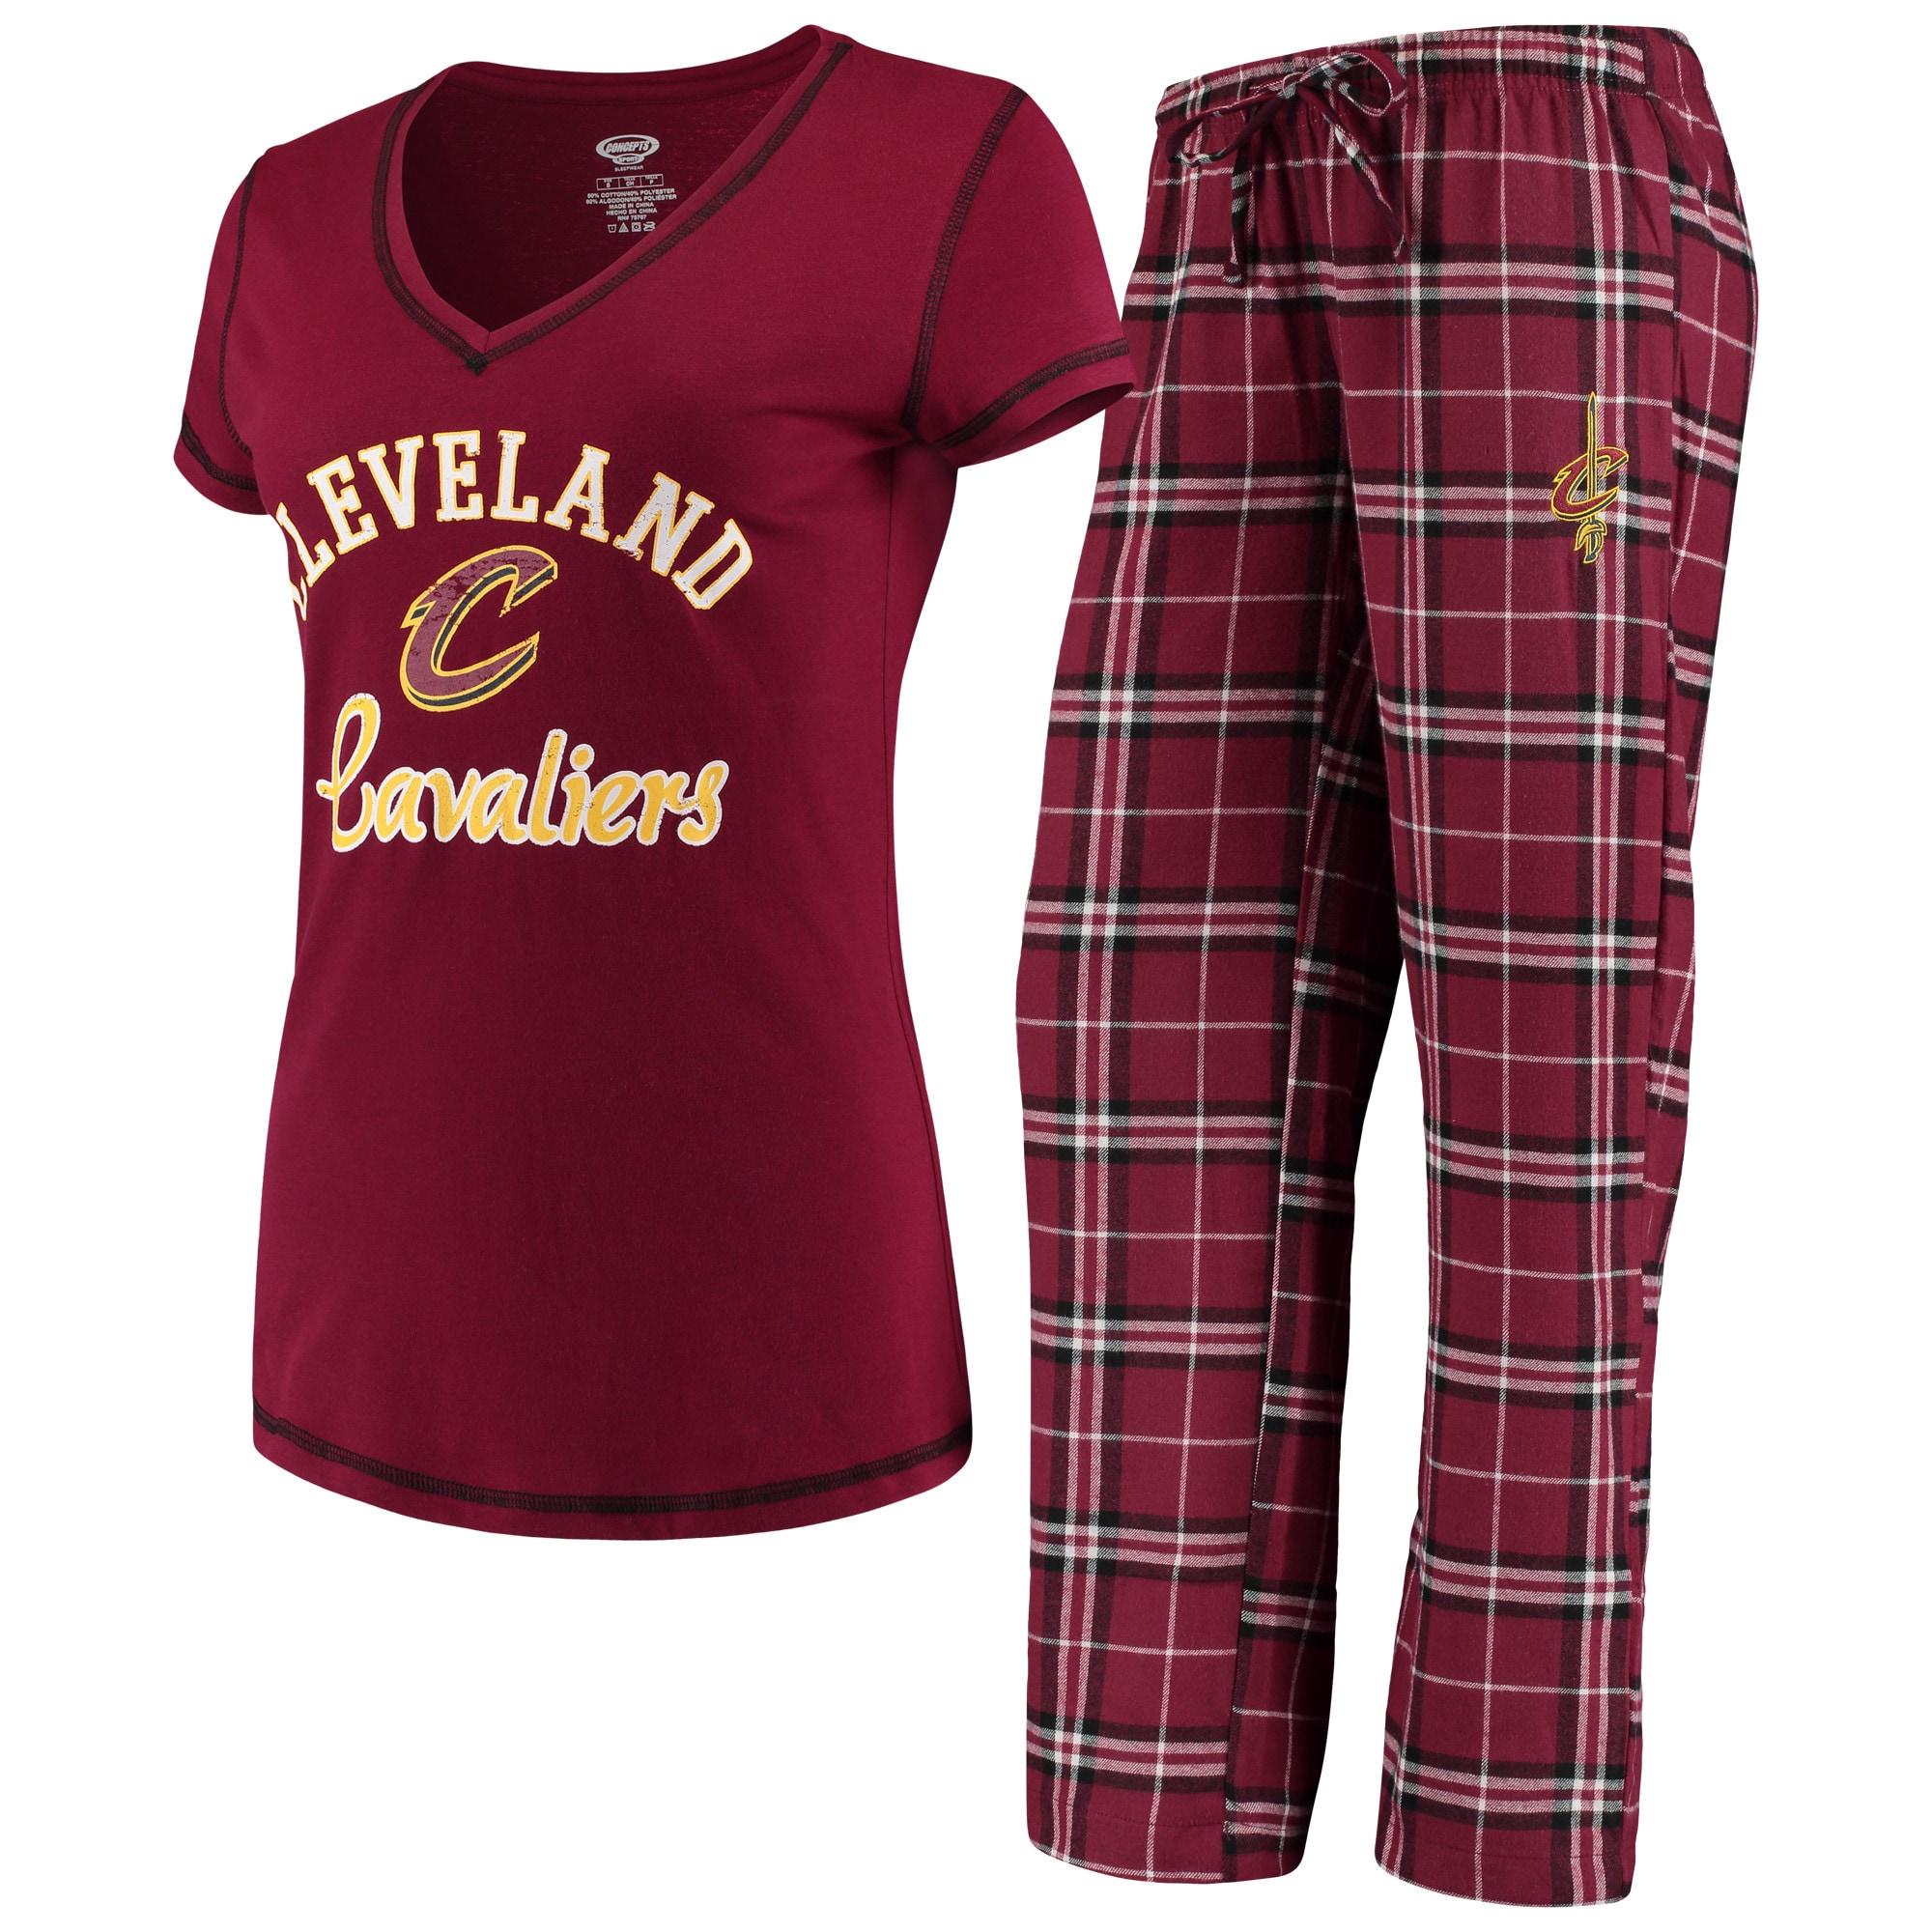 Cleveland Cavaliers Concepts Sport Women's Duo V-Neck T-Shirt & Pants Sleep Set - Wine